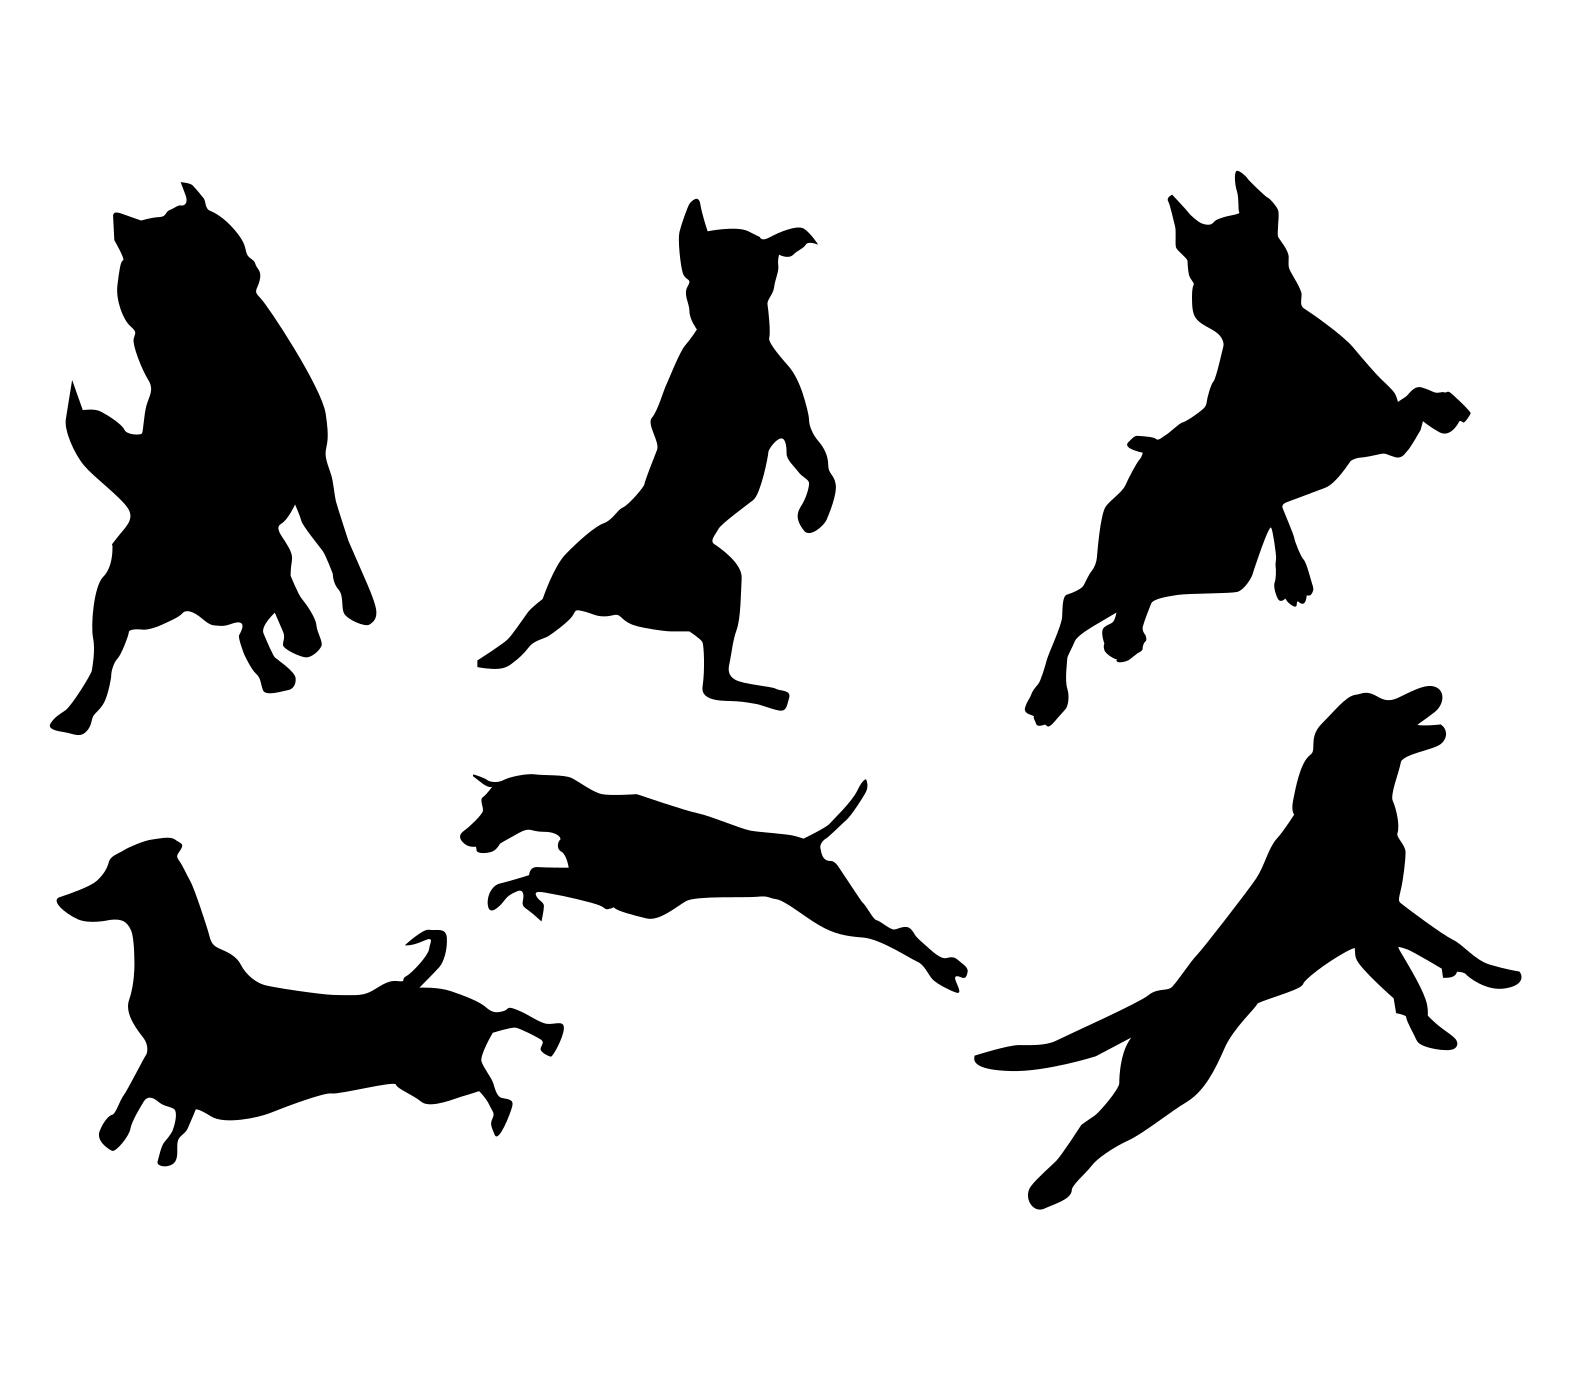 Komplet naklejek skaczace psy 6 sztuk 45cm  x 35cm